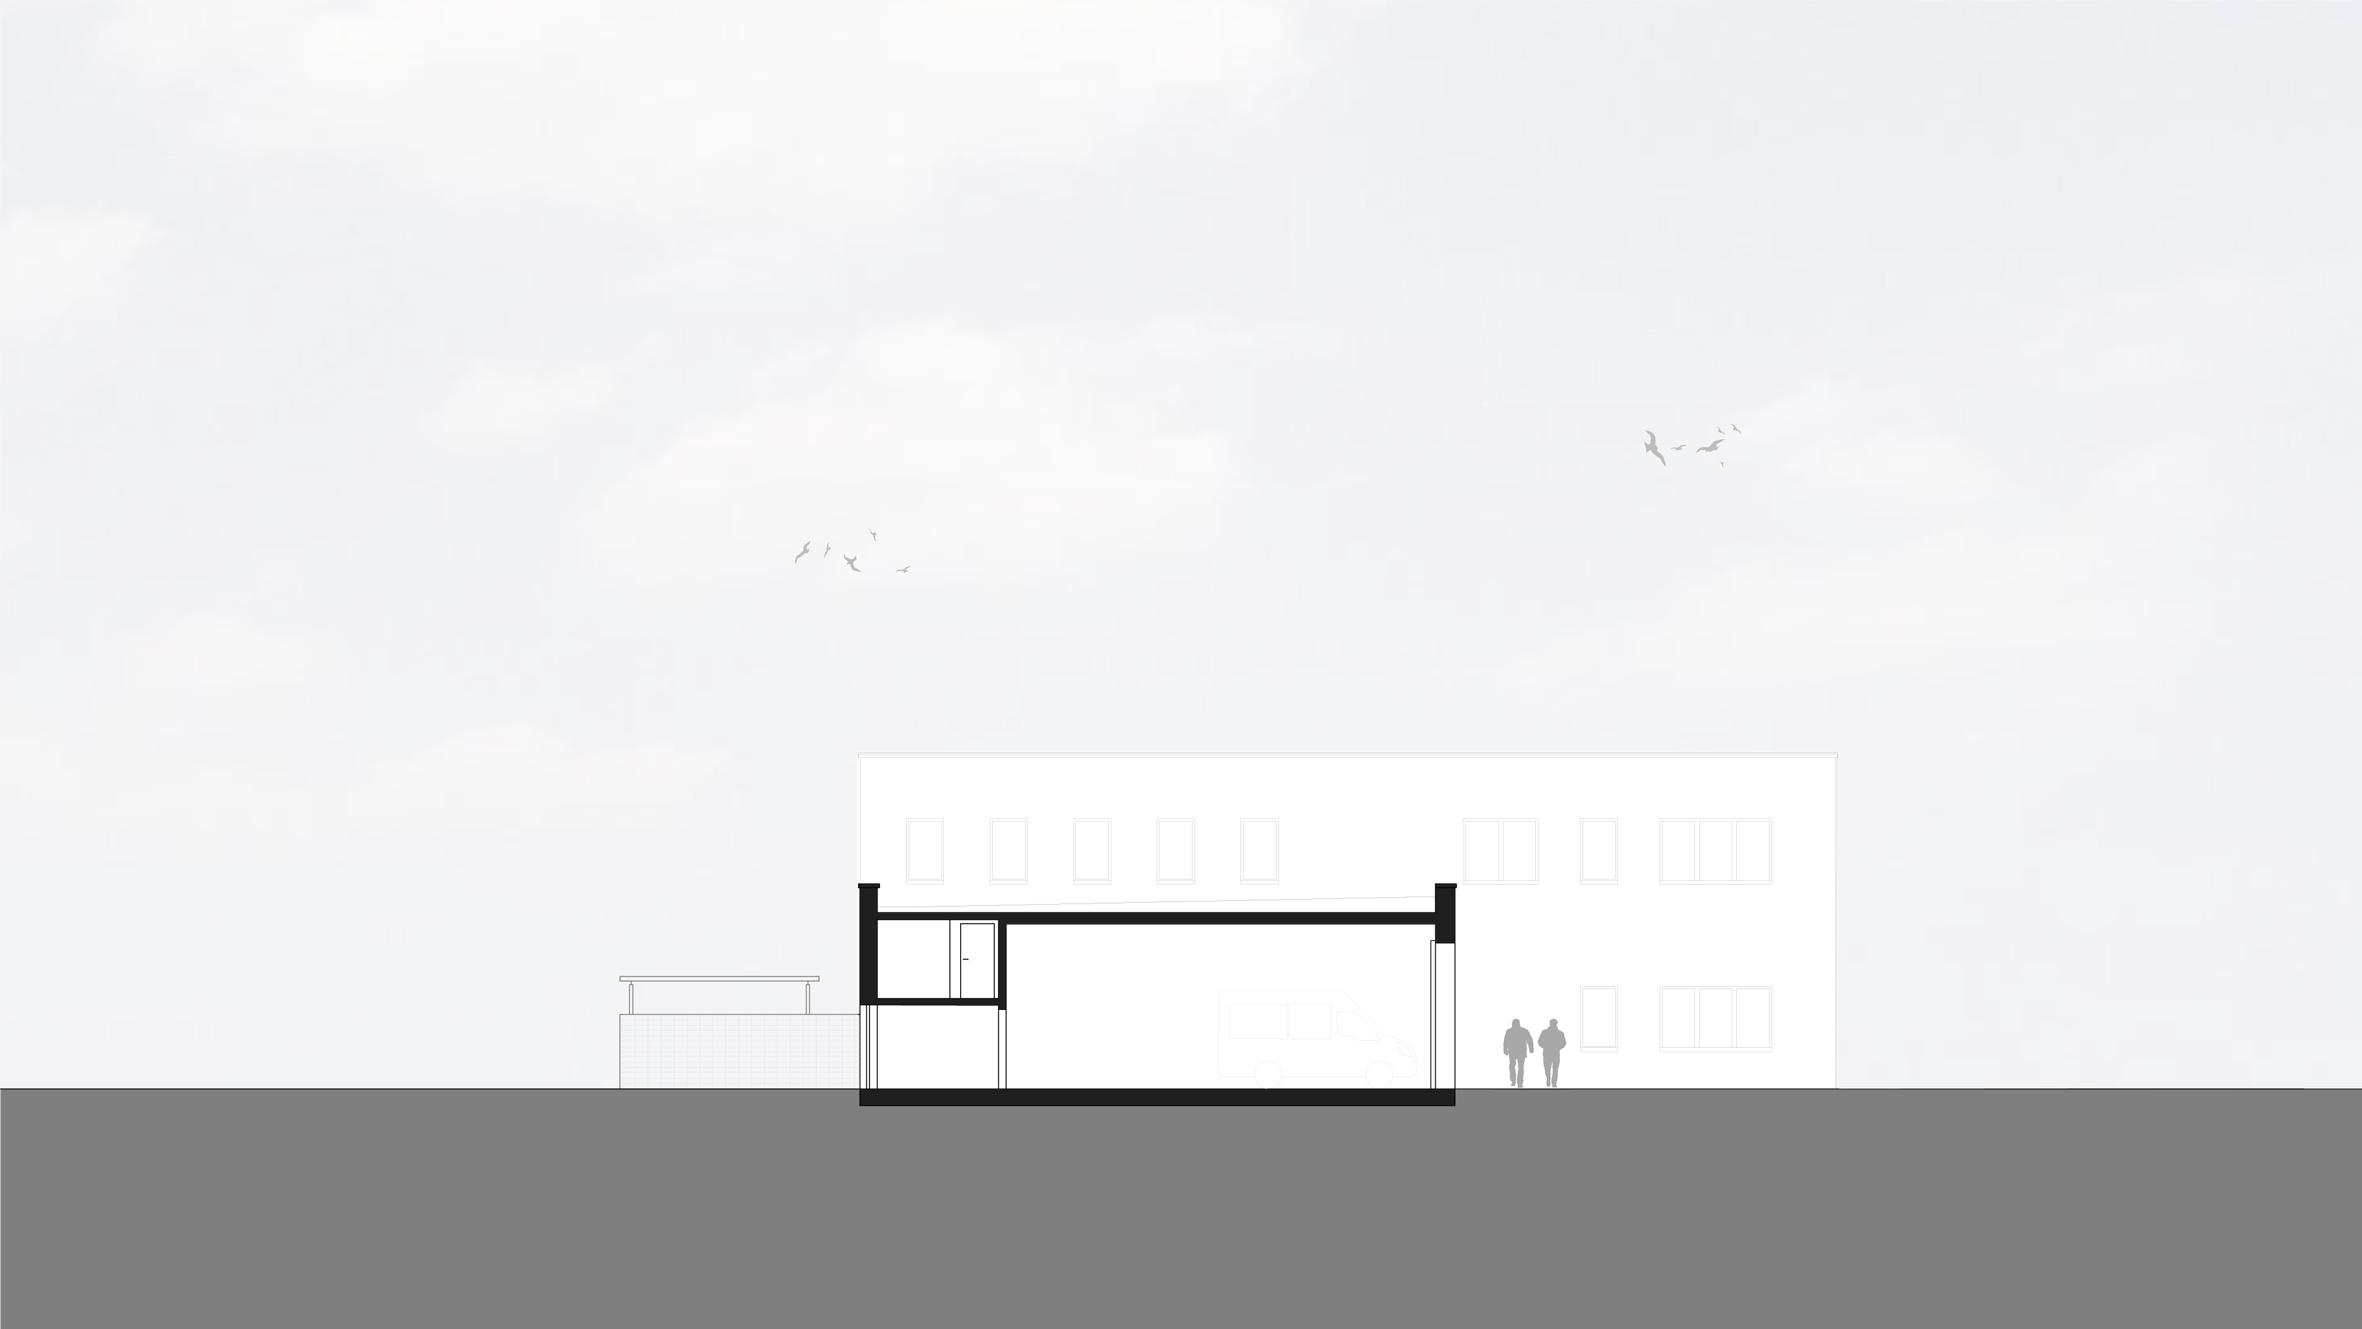 Architekt Bonn Neubau Rettungswache Oberpleis - Koenigs Rütter Architekten Bonn